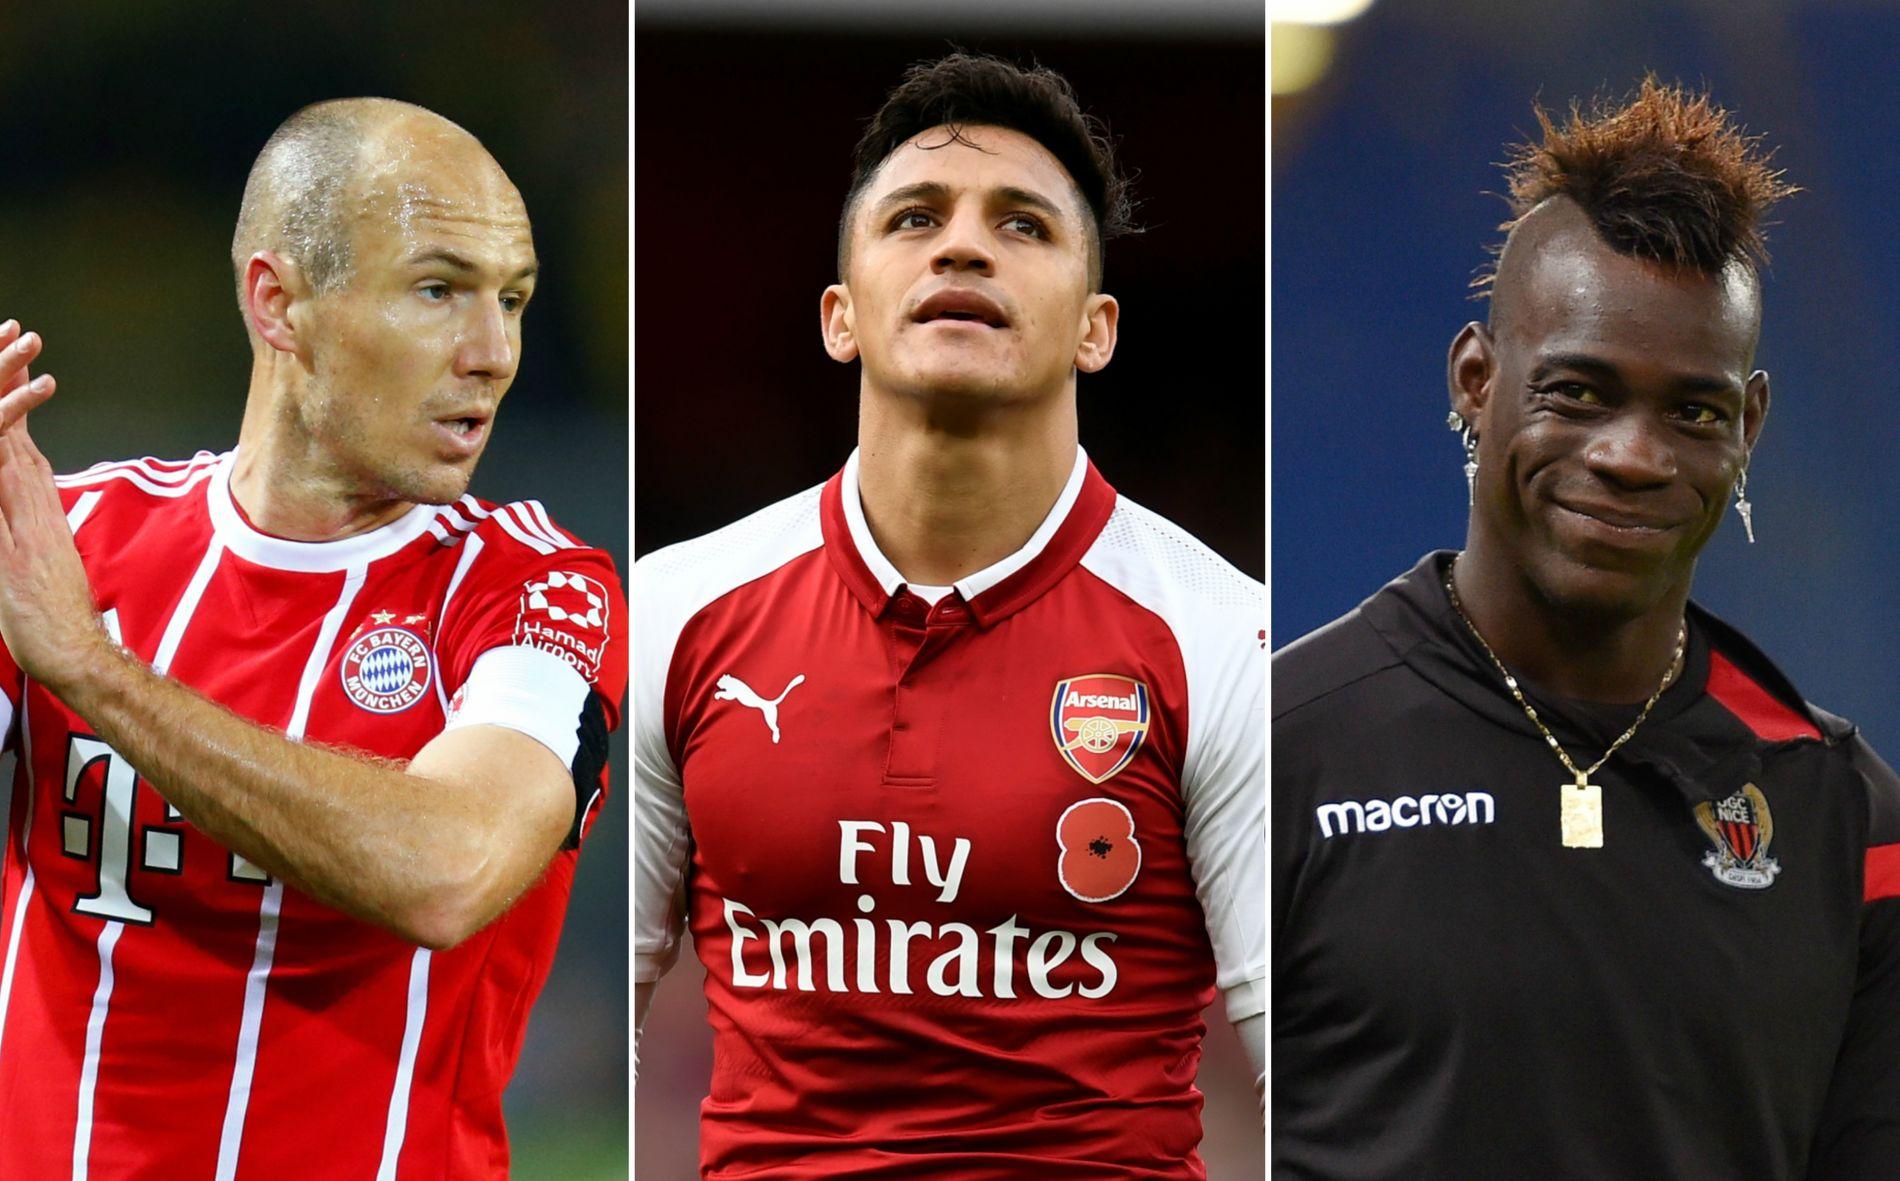 USIKKER FREMTID: Arjen Robben (Bayern München, f.v.), Alexis Sánchez (Arsenal) og Mario Balotelli (Nice) er blant spillerne med kontrakt som utløper til sommeren.